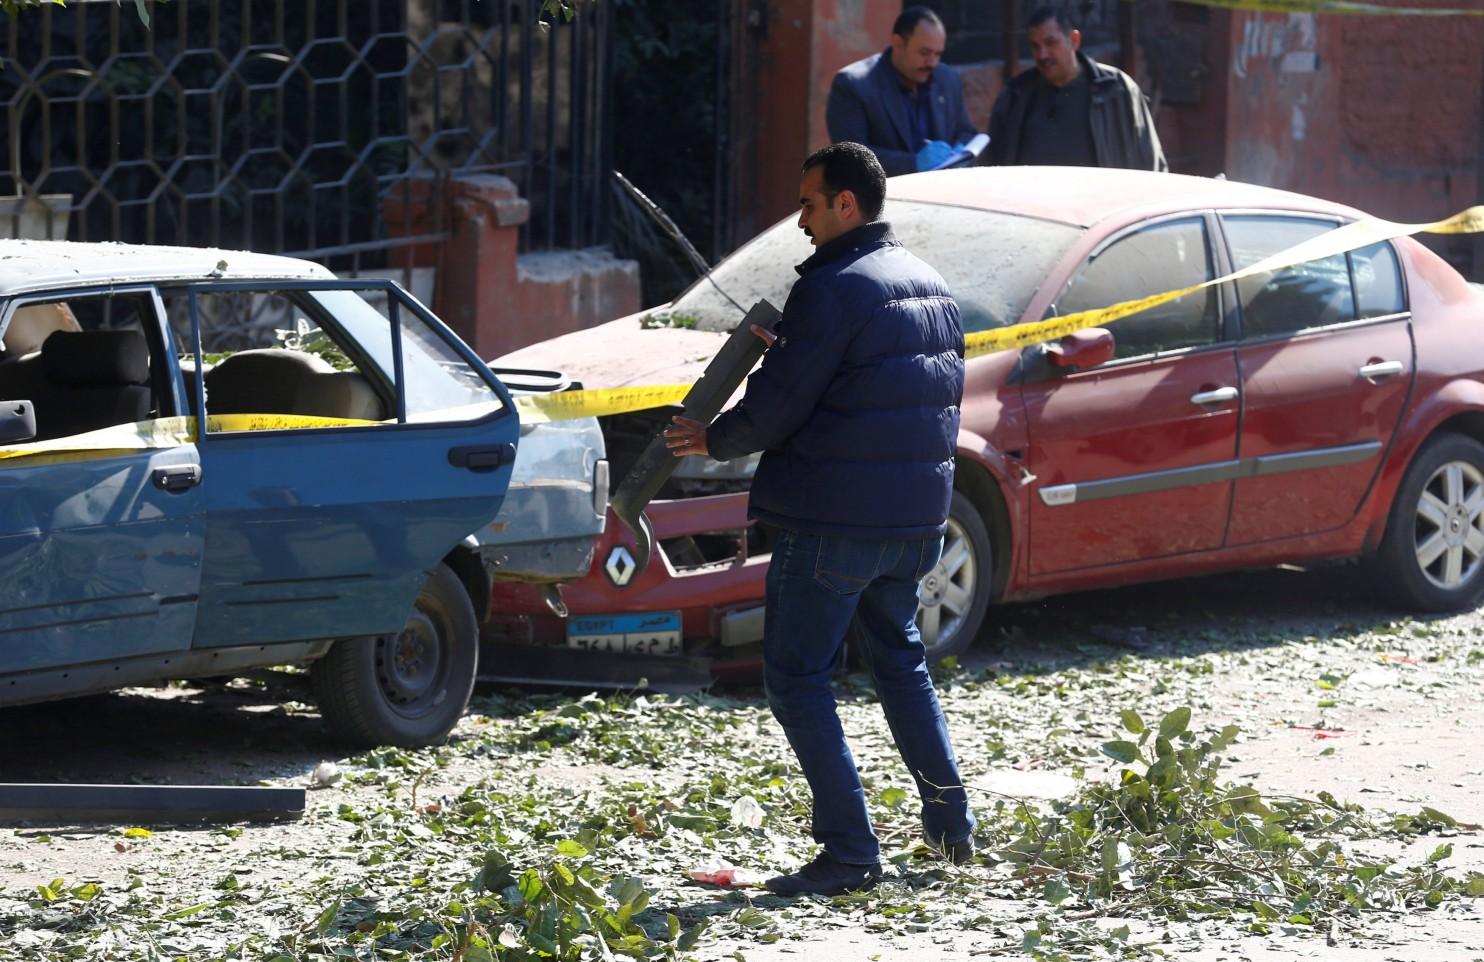 2016-12-09T113323Z_01_GGG-AMR015_RTRIDSP_3_EGYPT-VIOLENCE-BLAST-4766